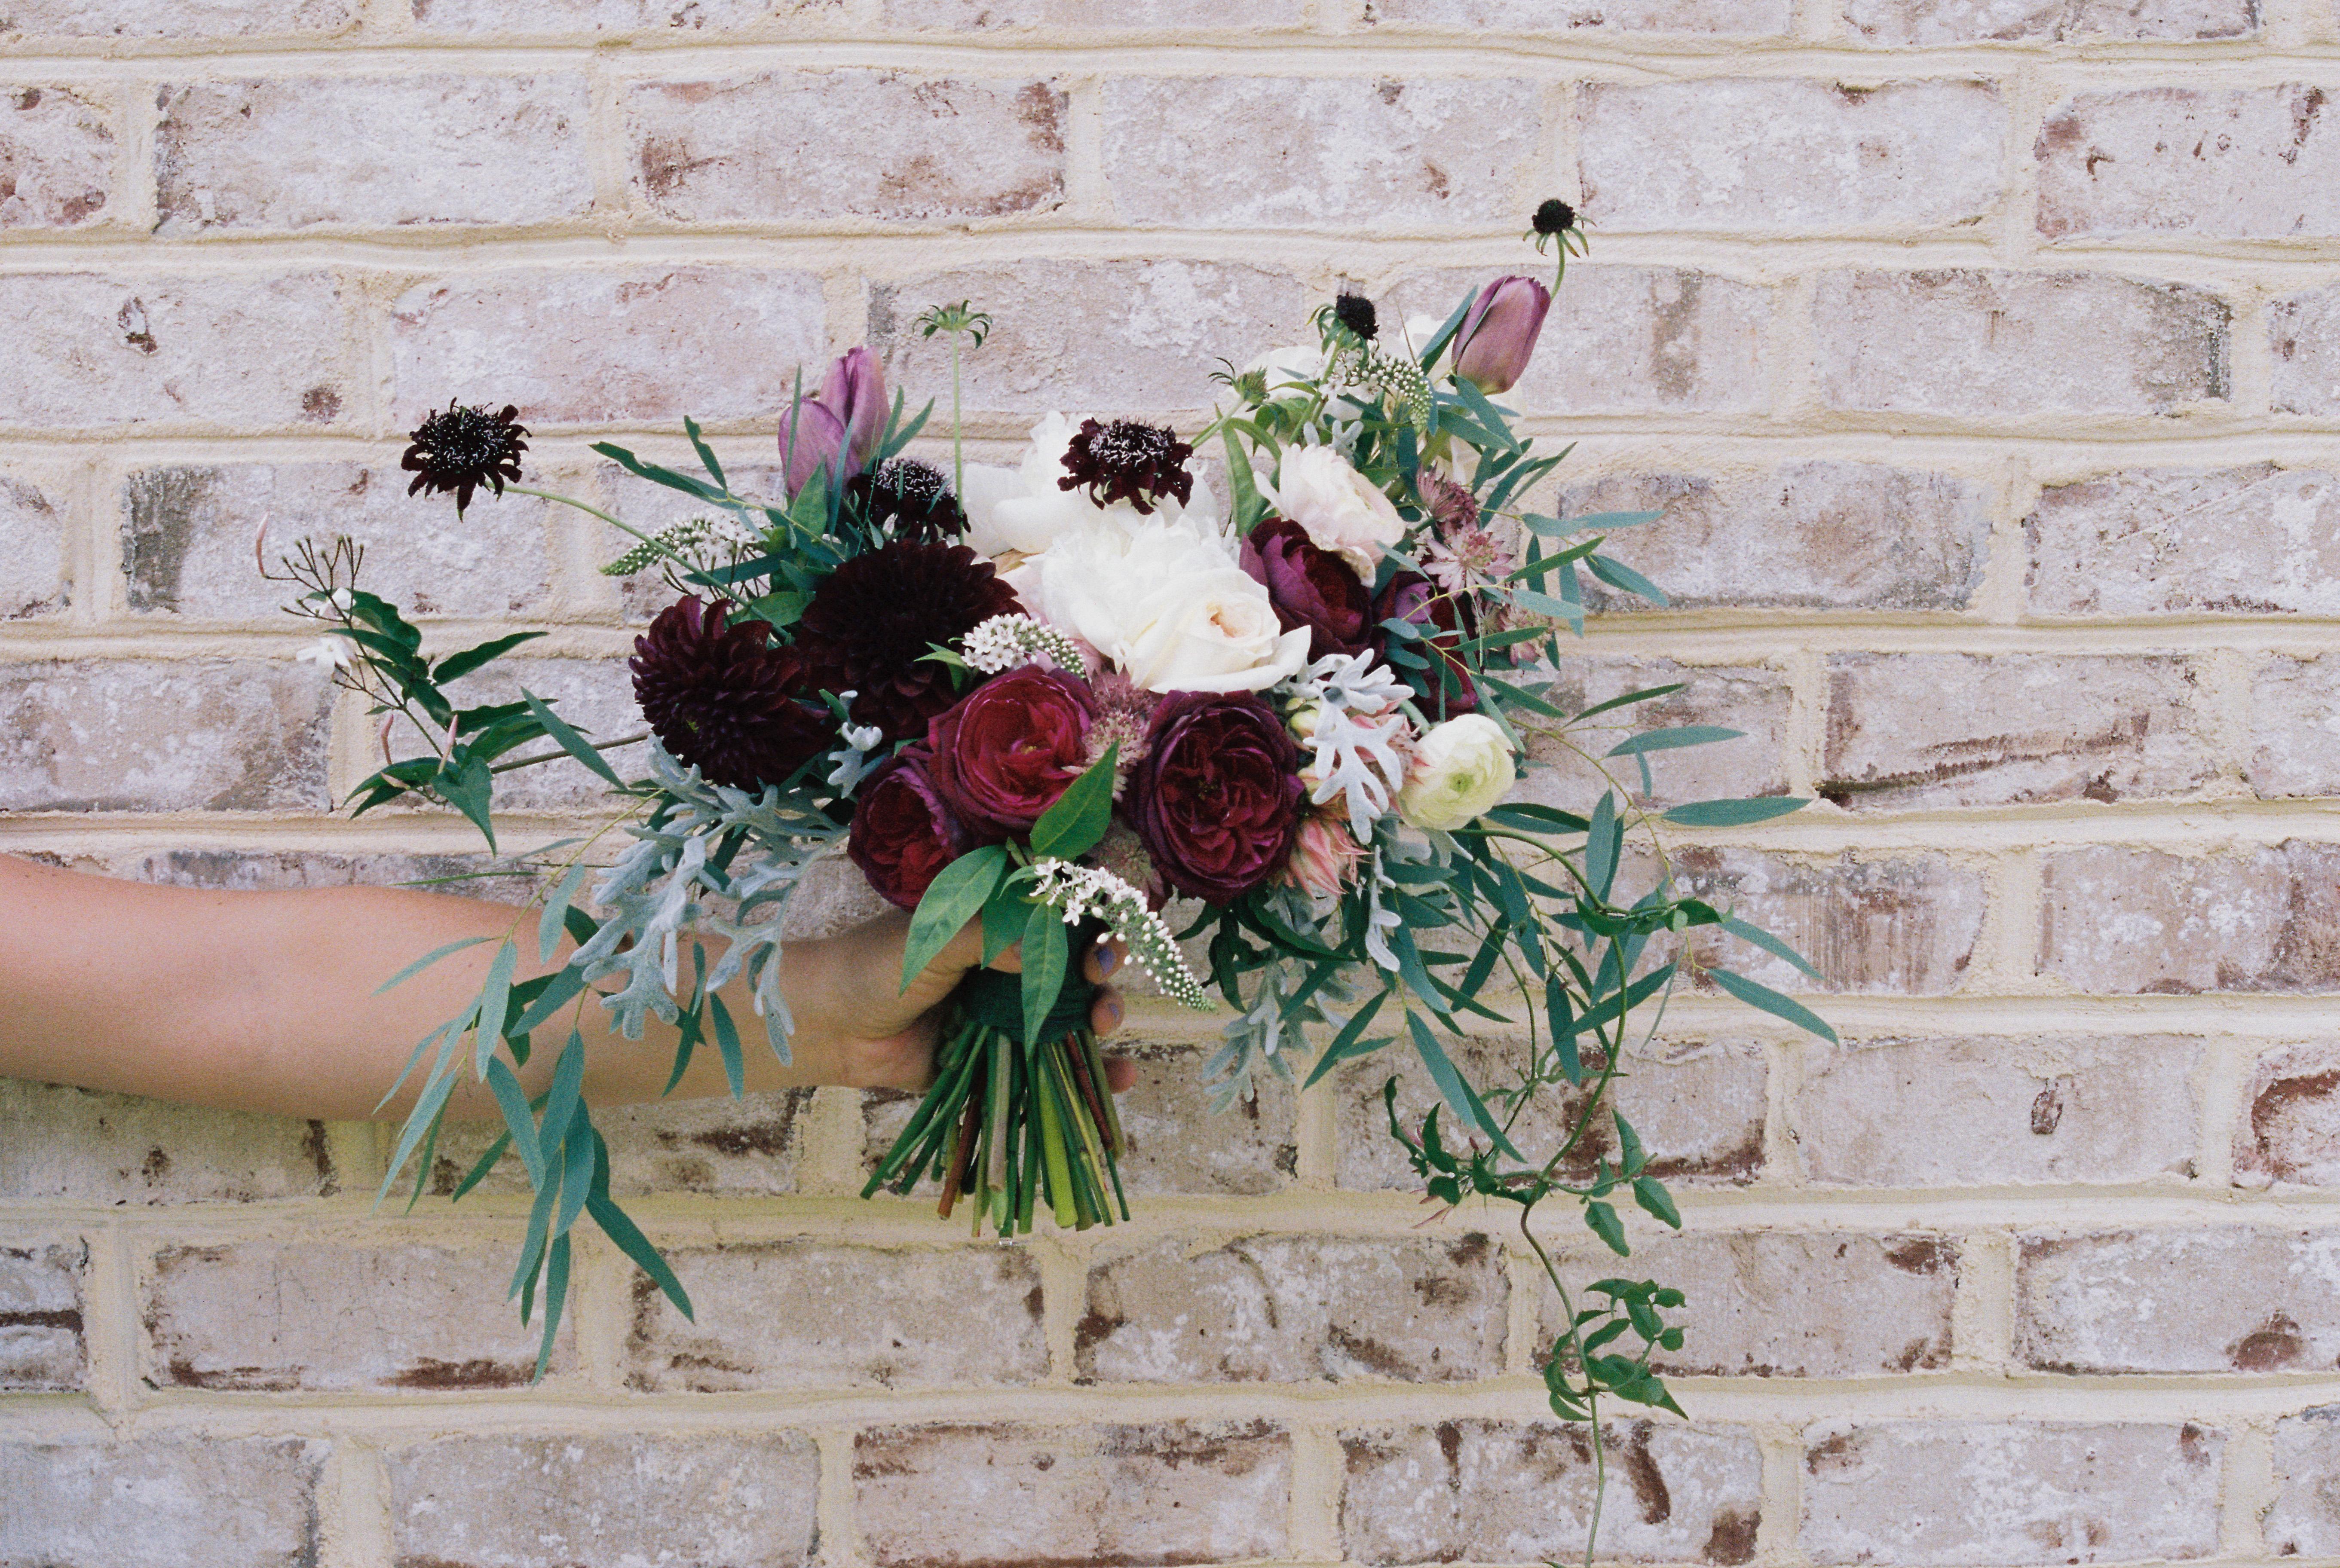 Free Images : plant, wedding, holding, flora, painting, art ...